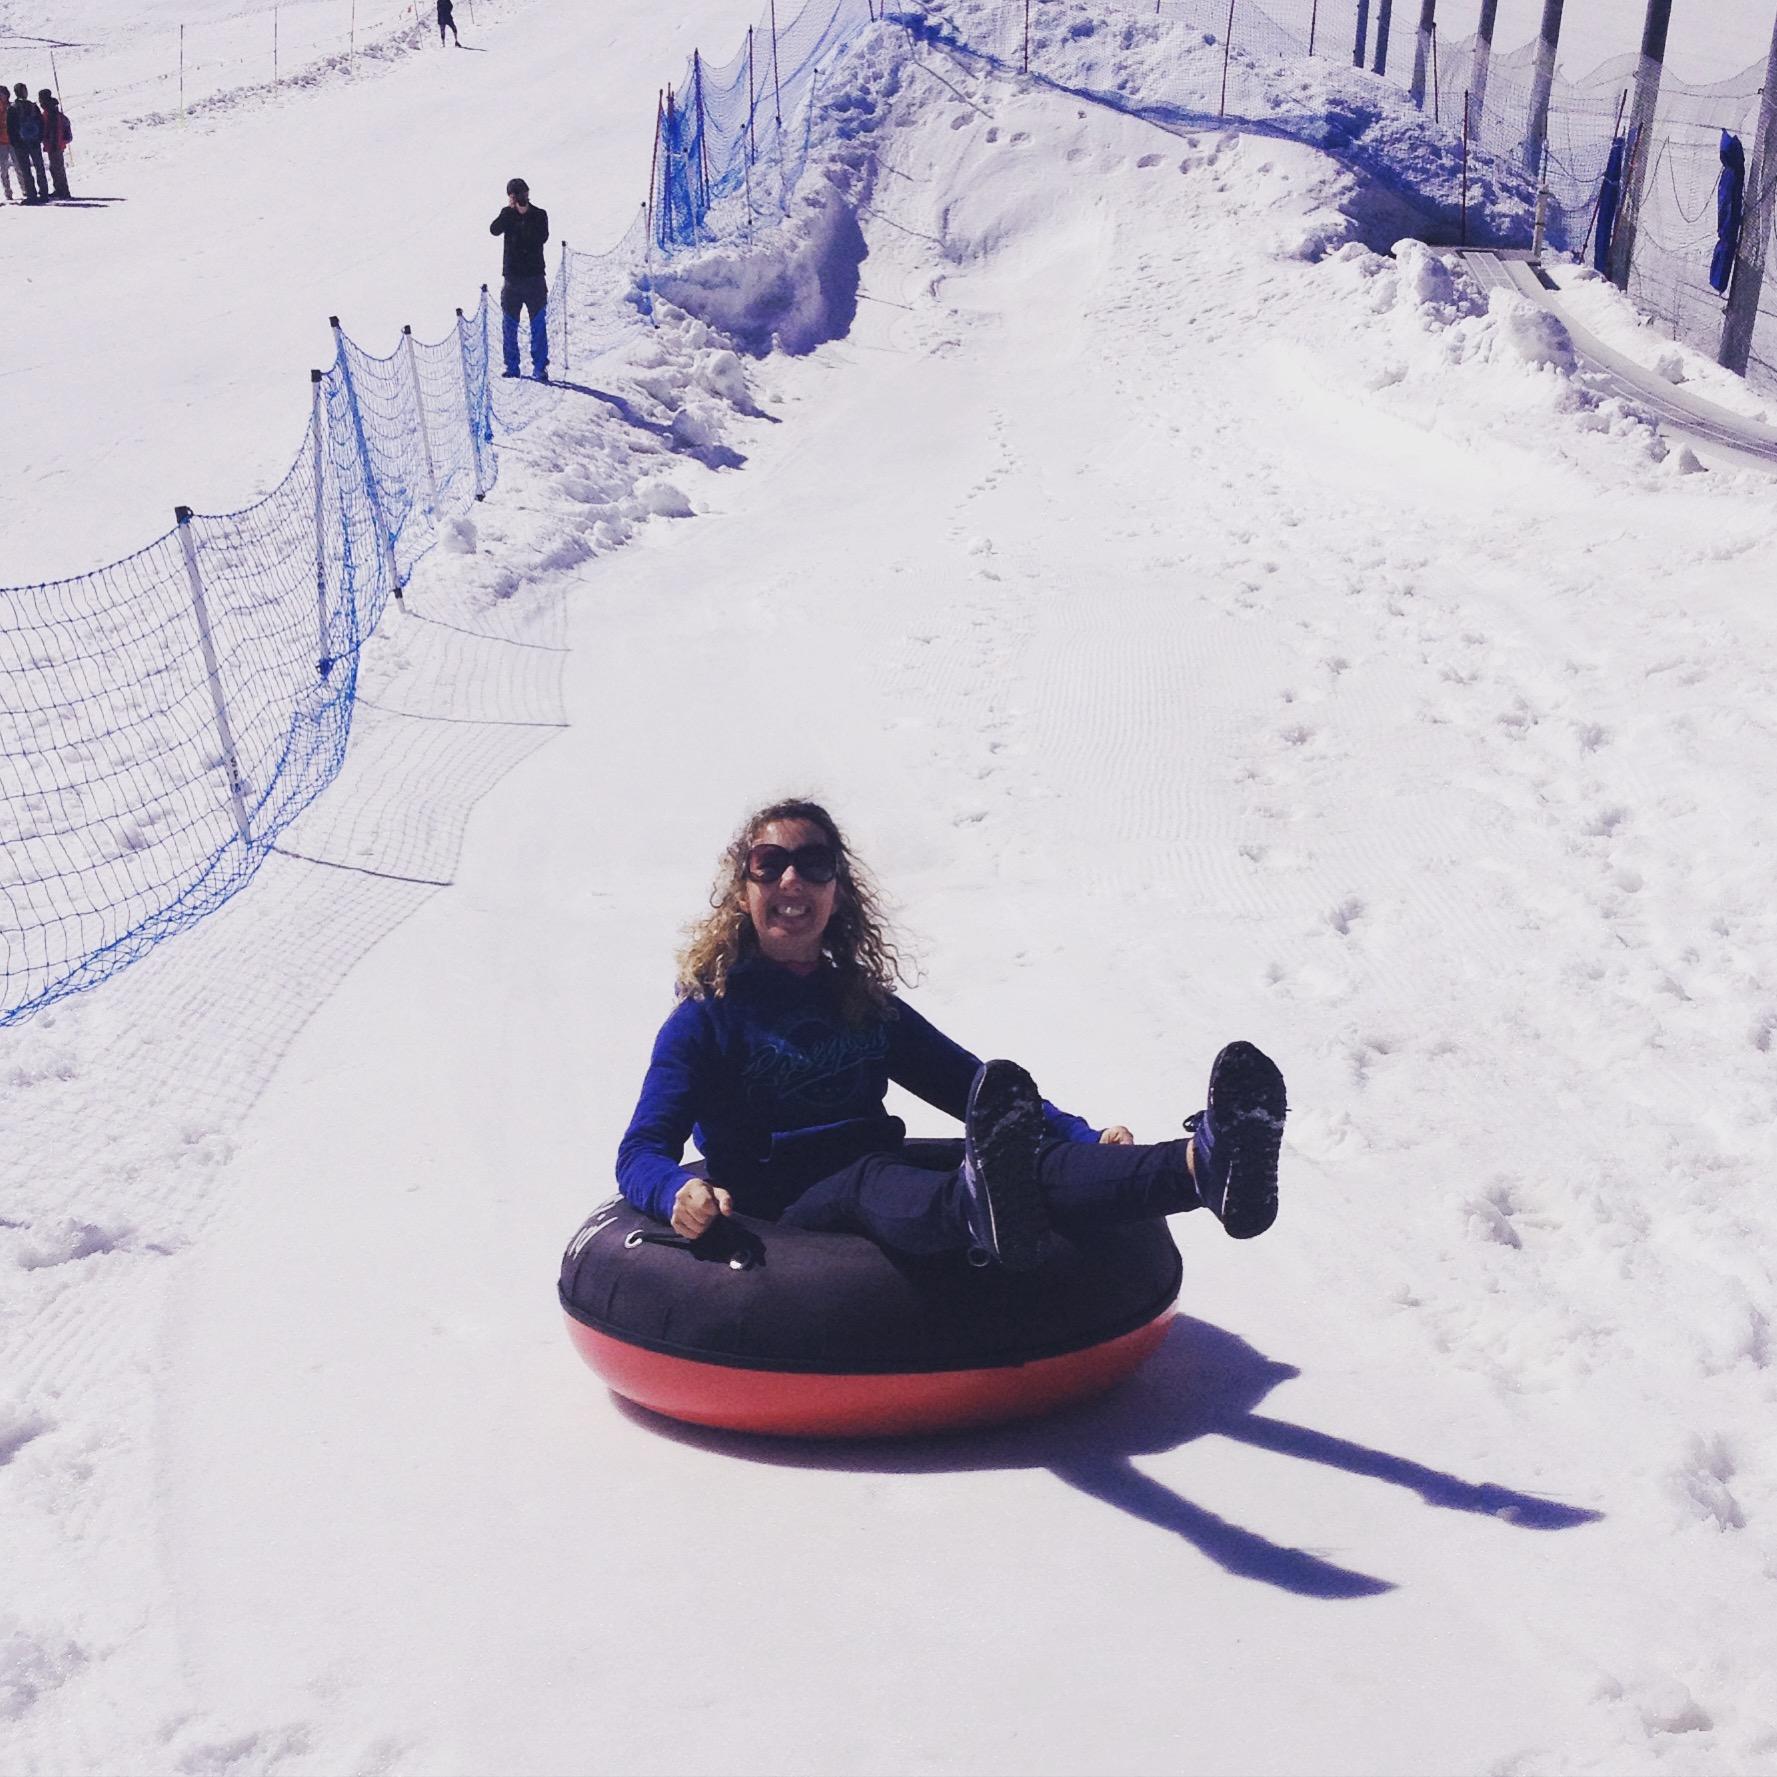 Snow tubing sul terhorn Glacier Paradise @oltreilbalcone